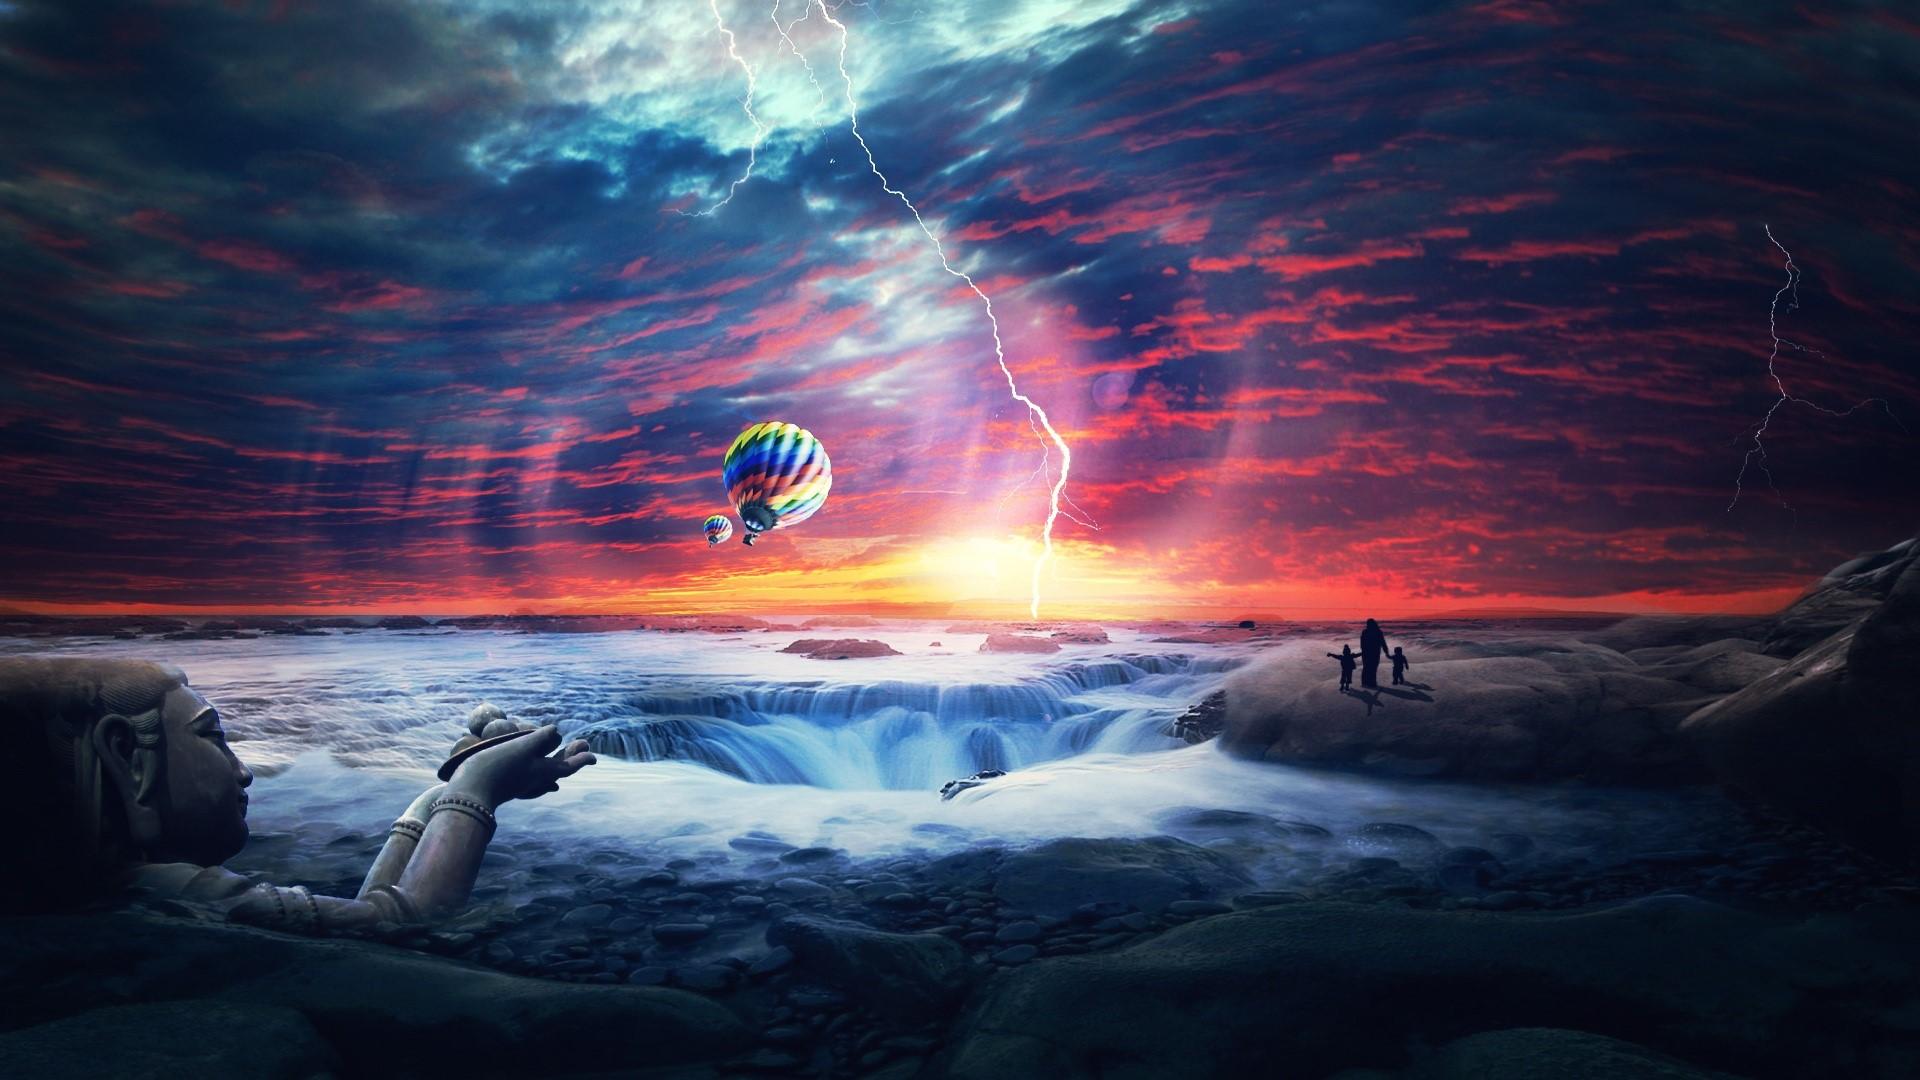 Wallpaper Apocalyptic sea